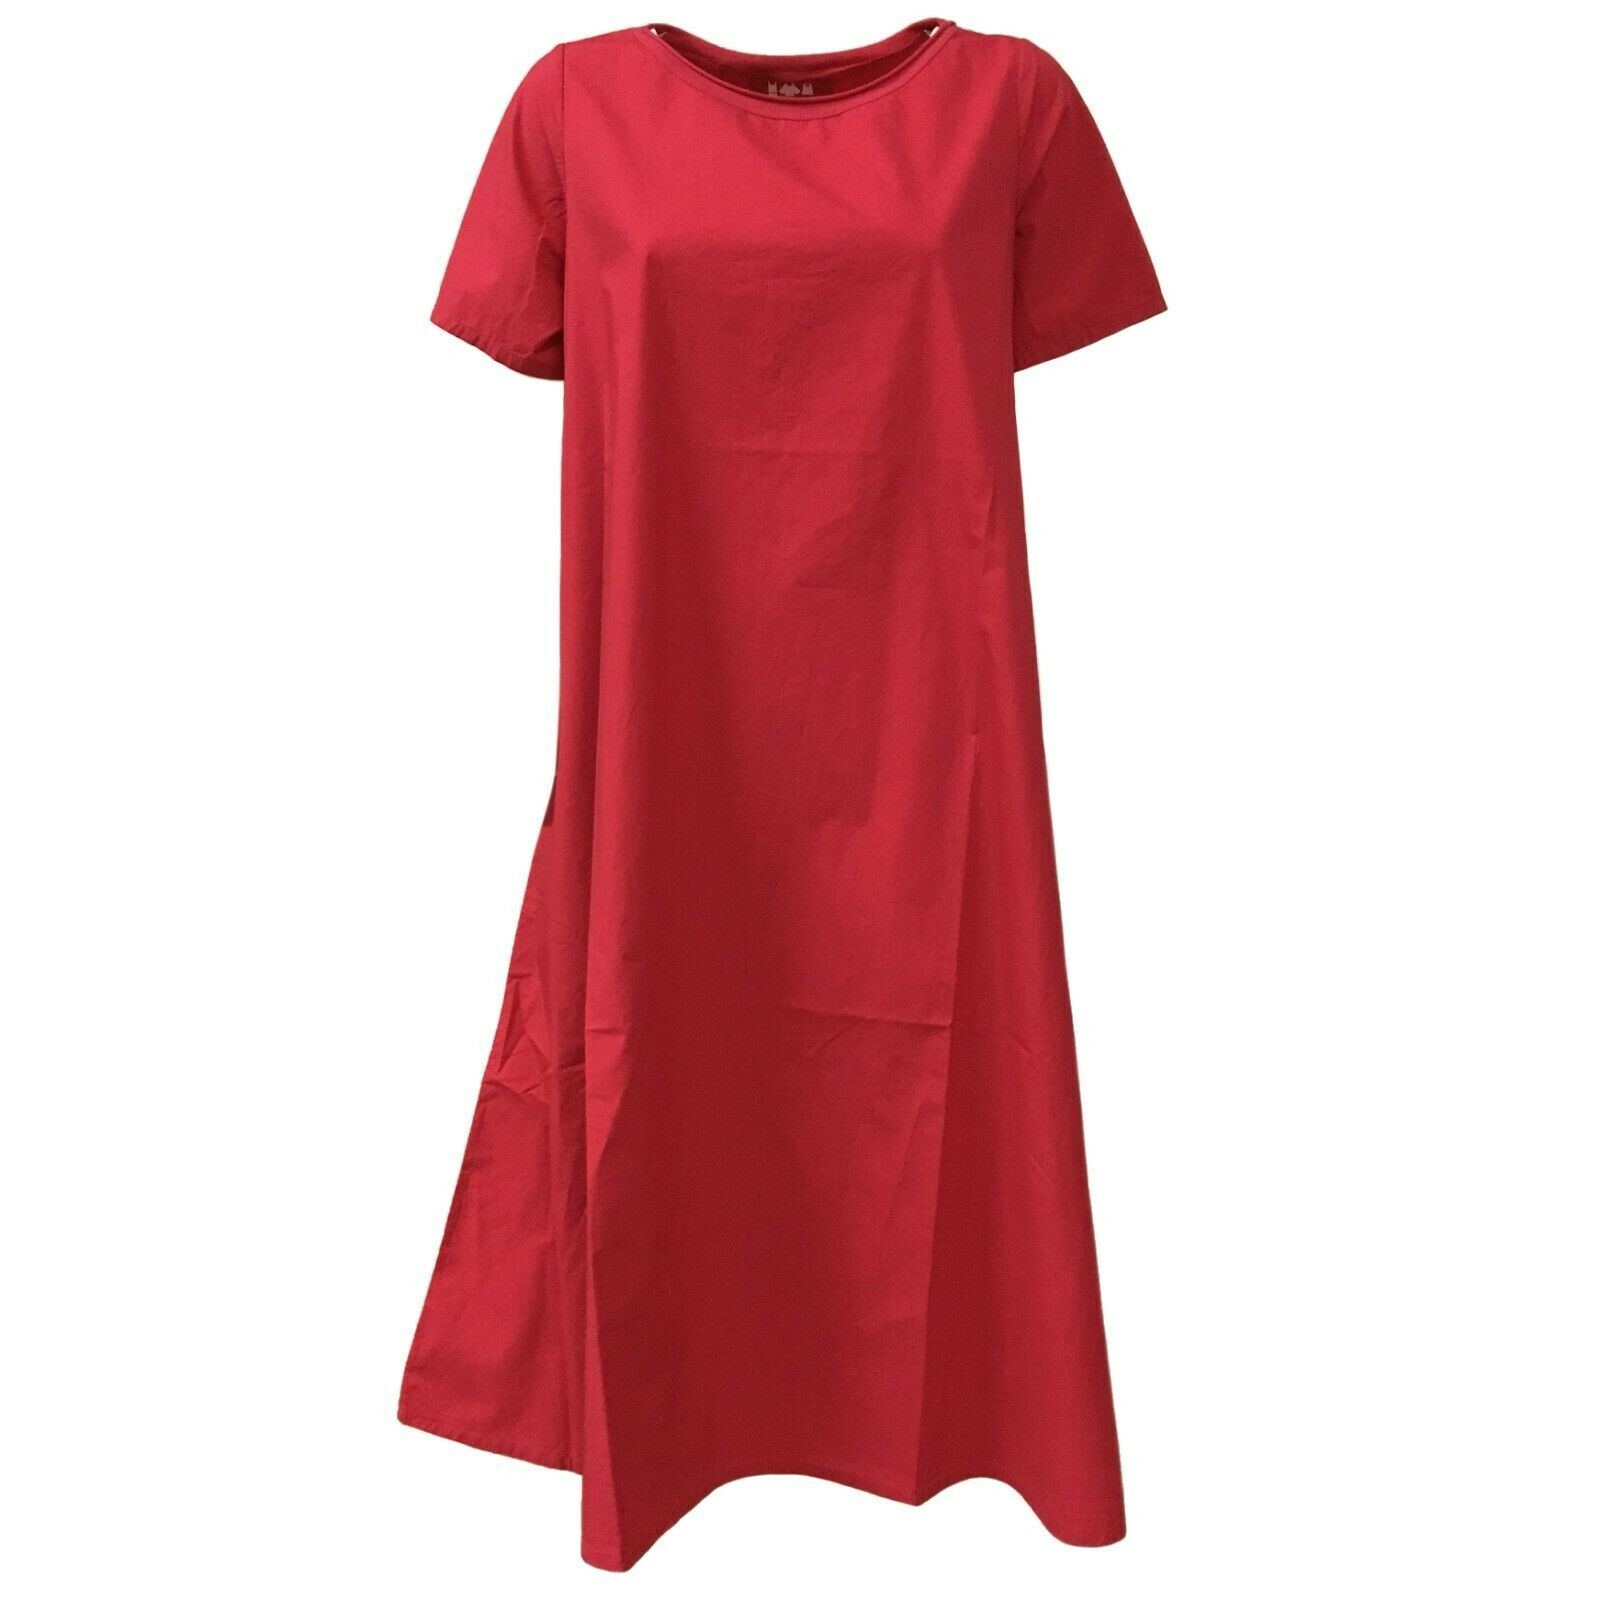 LABO.ART women's dress bouganville mod ABITO2 CLARA 100% cotton MADE IN ITALY